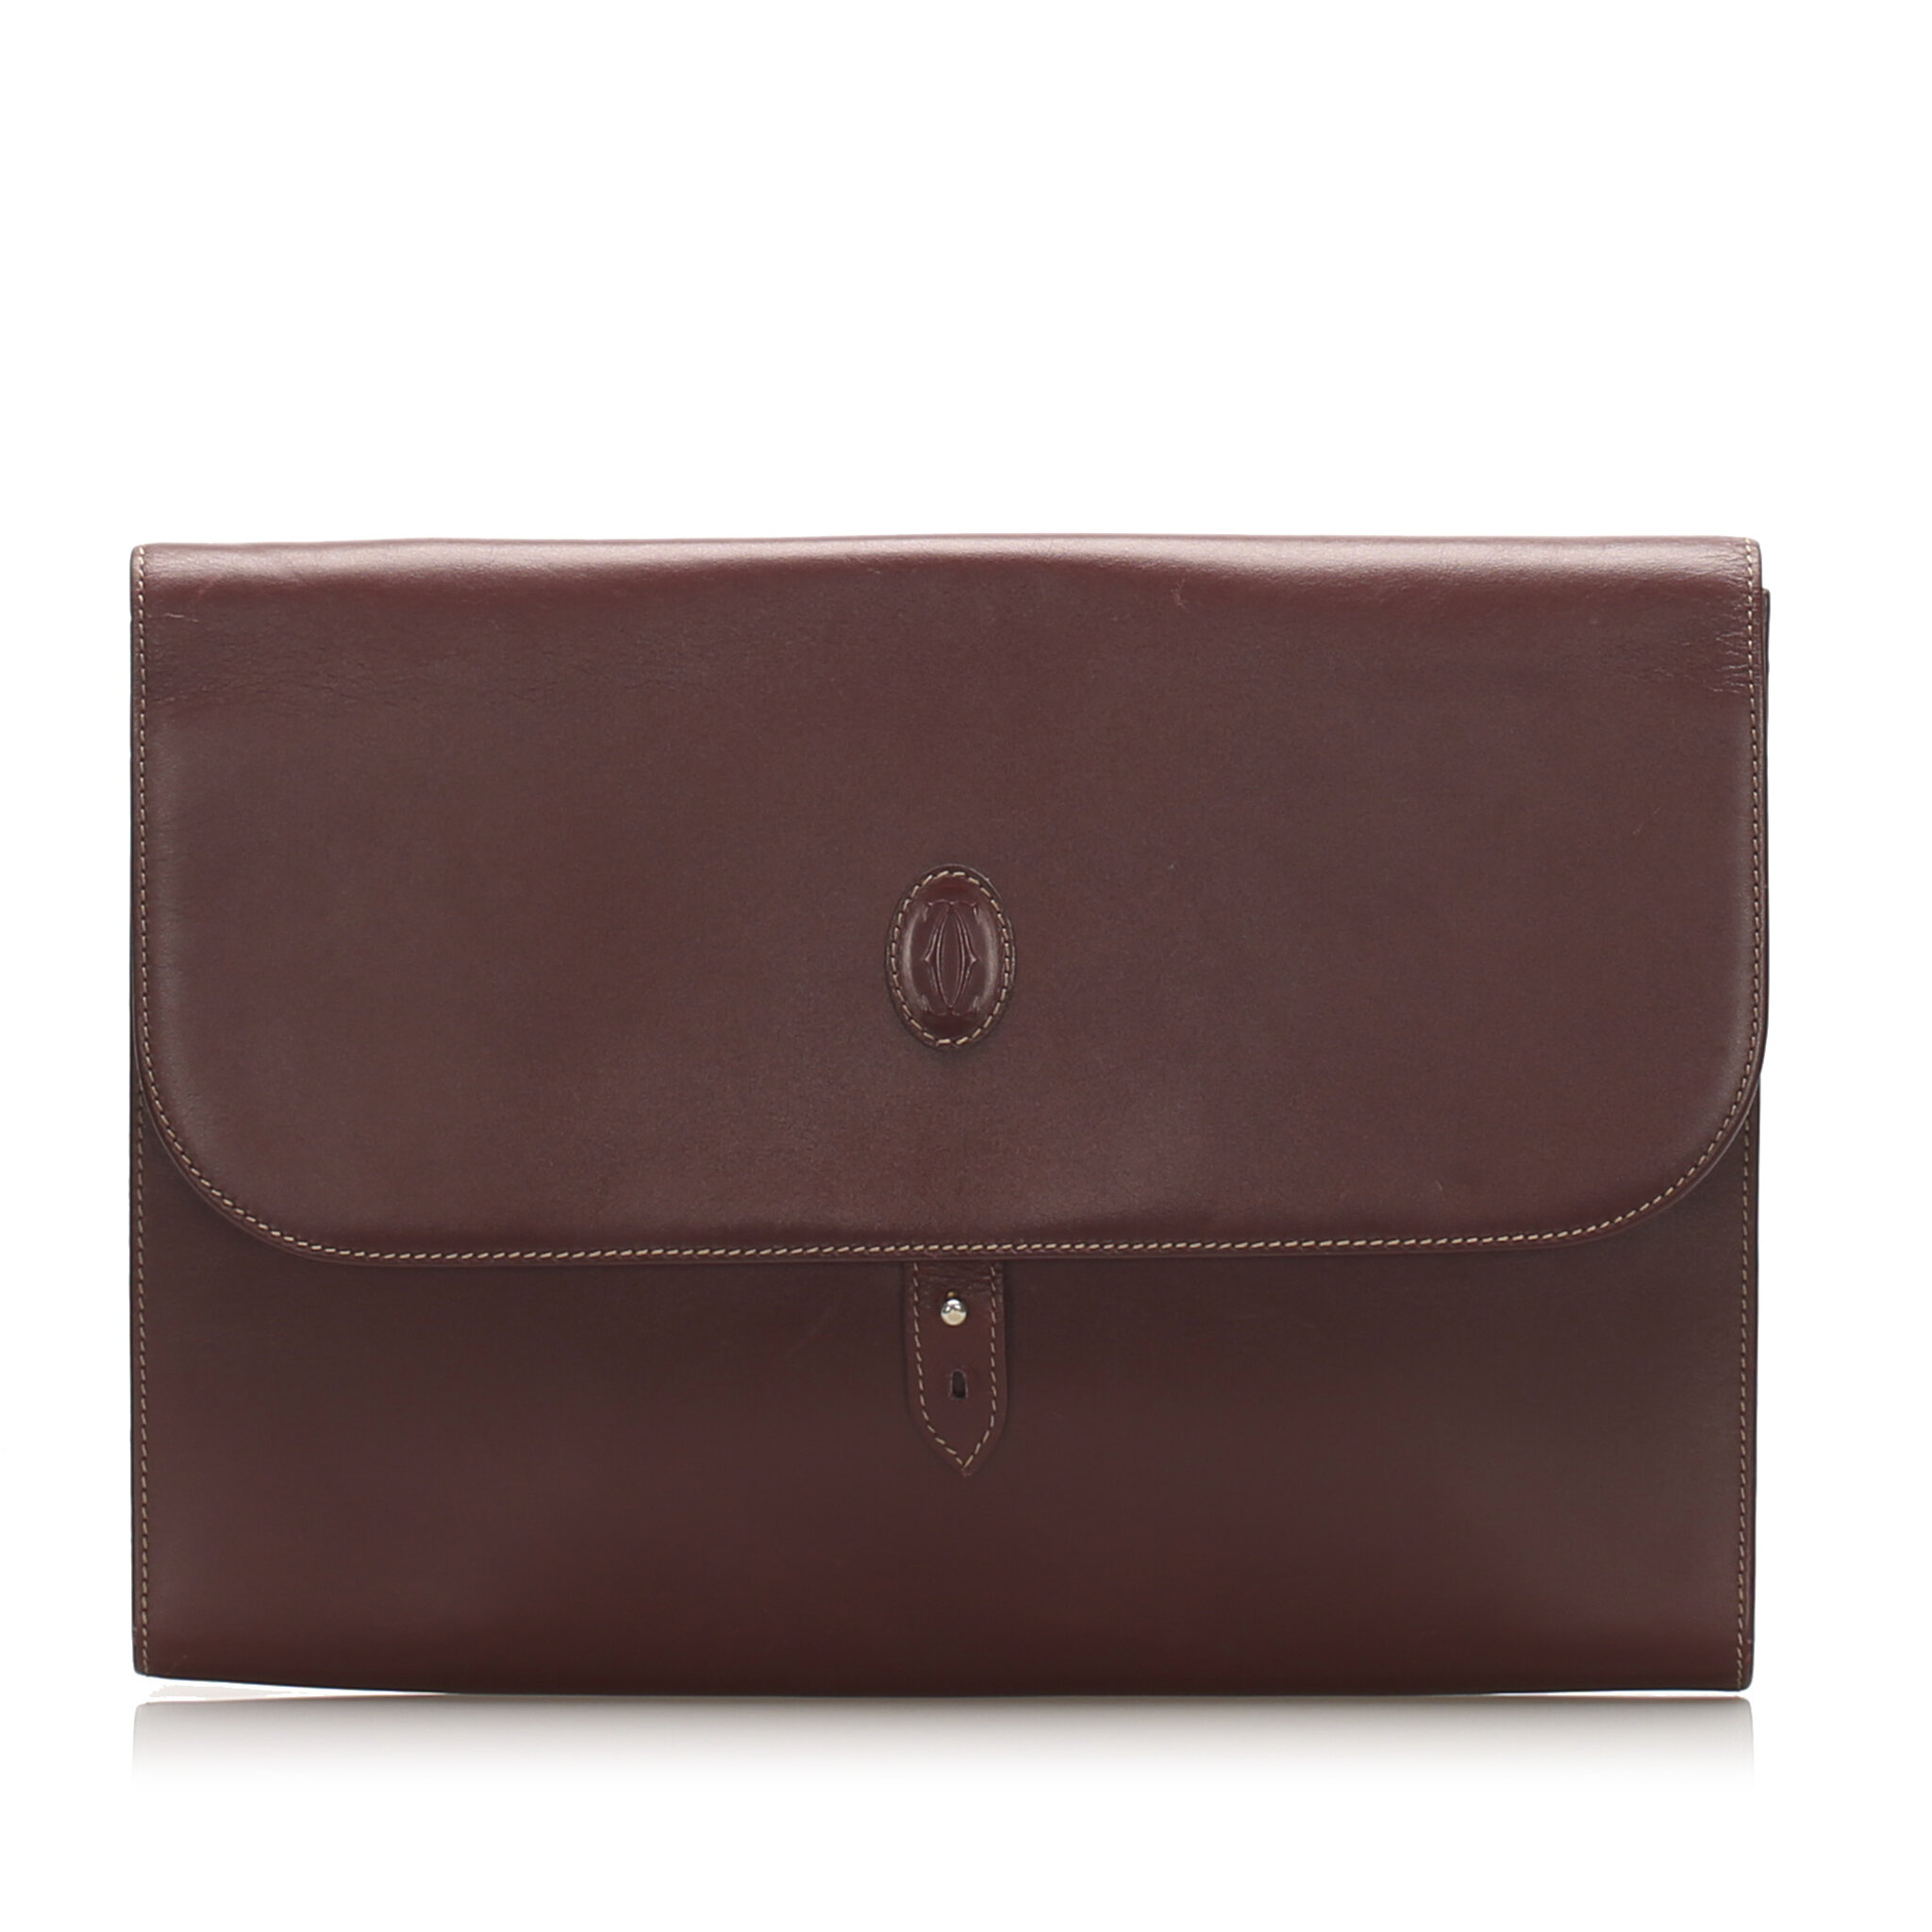 Cartier Must De Cartier Leather Business Bag